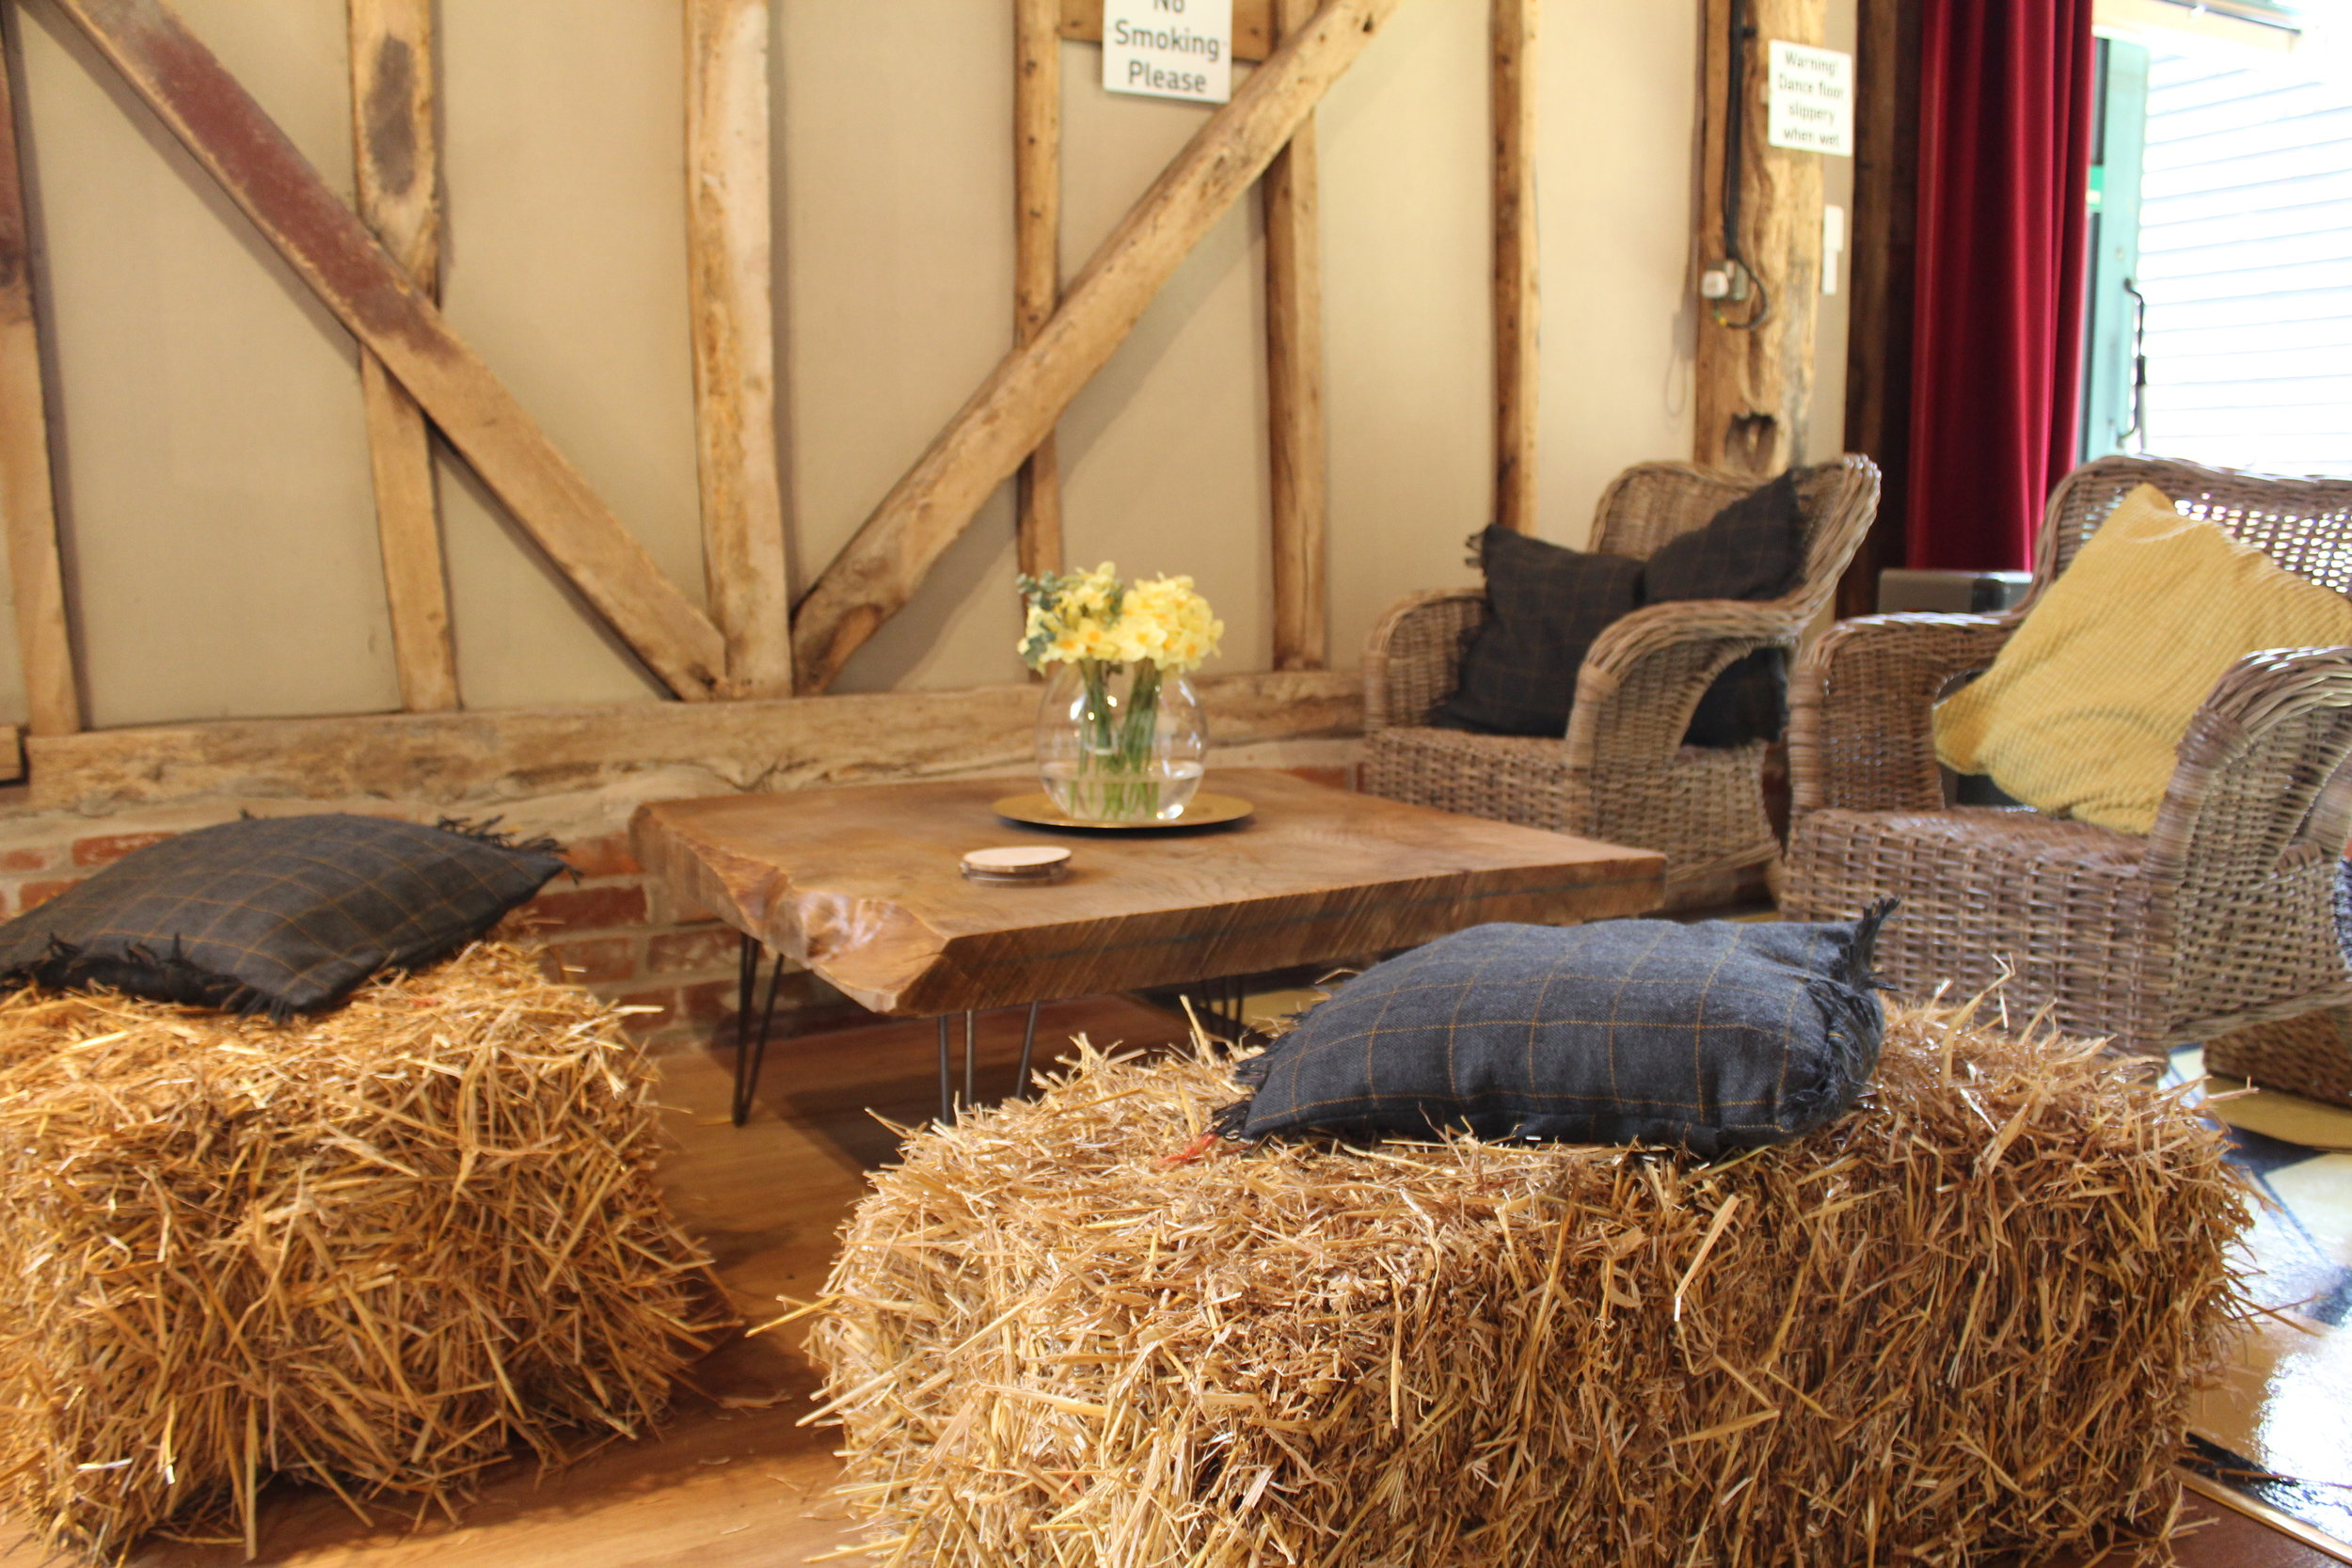 - Cedar of Lebanon coffee table3ft x 3ft £25